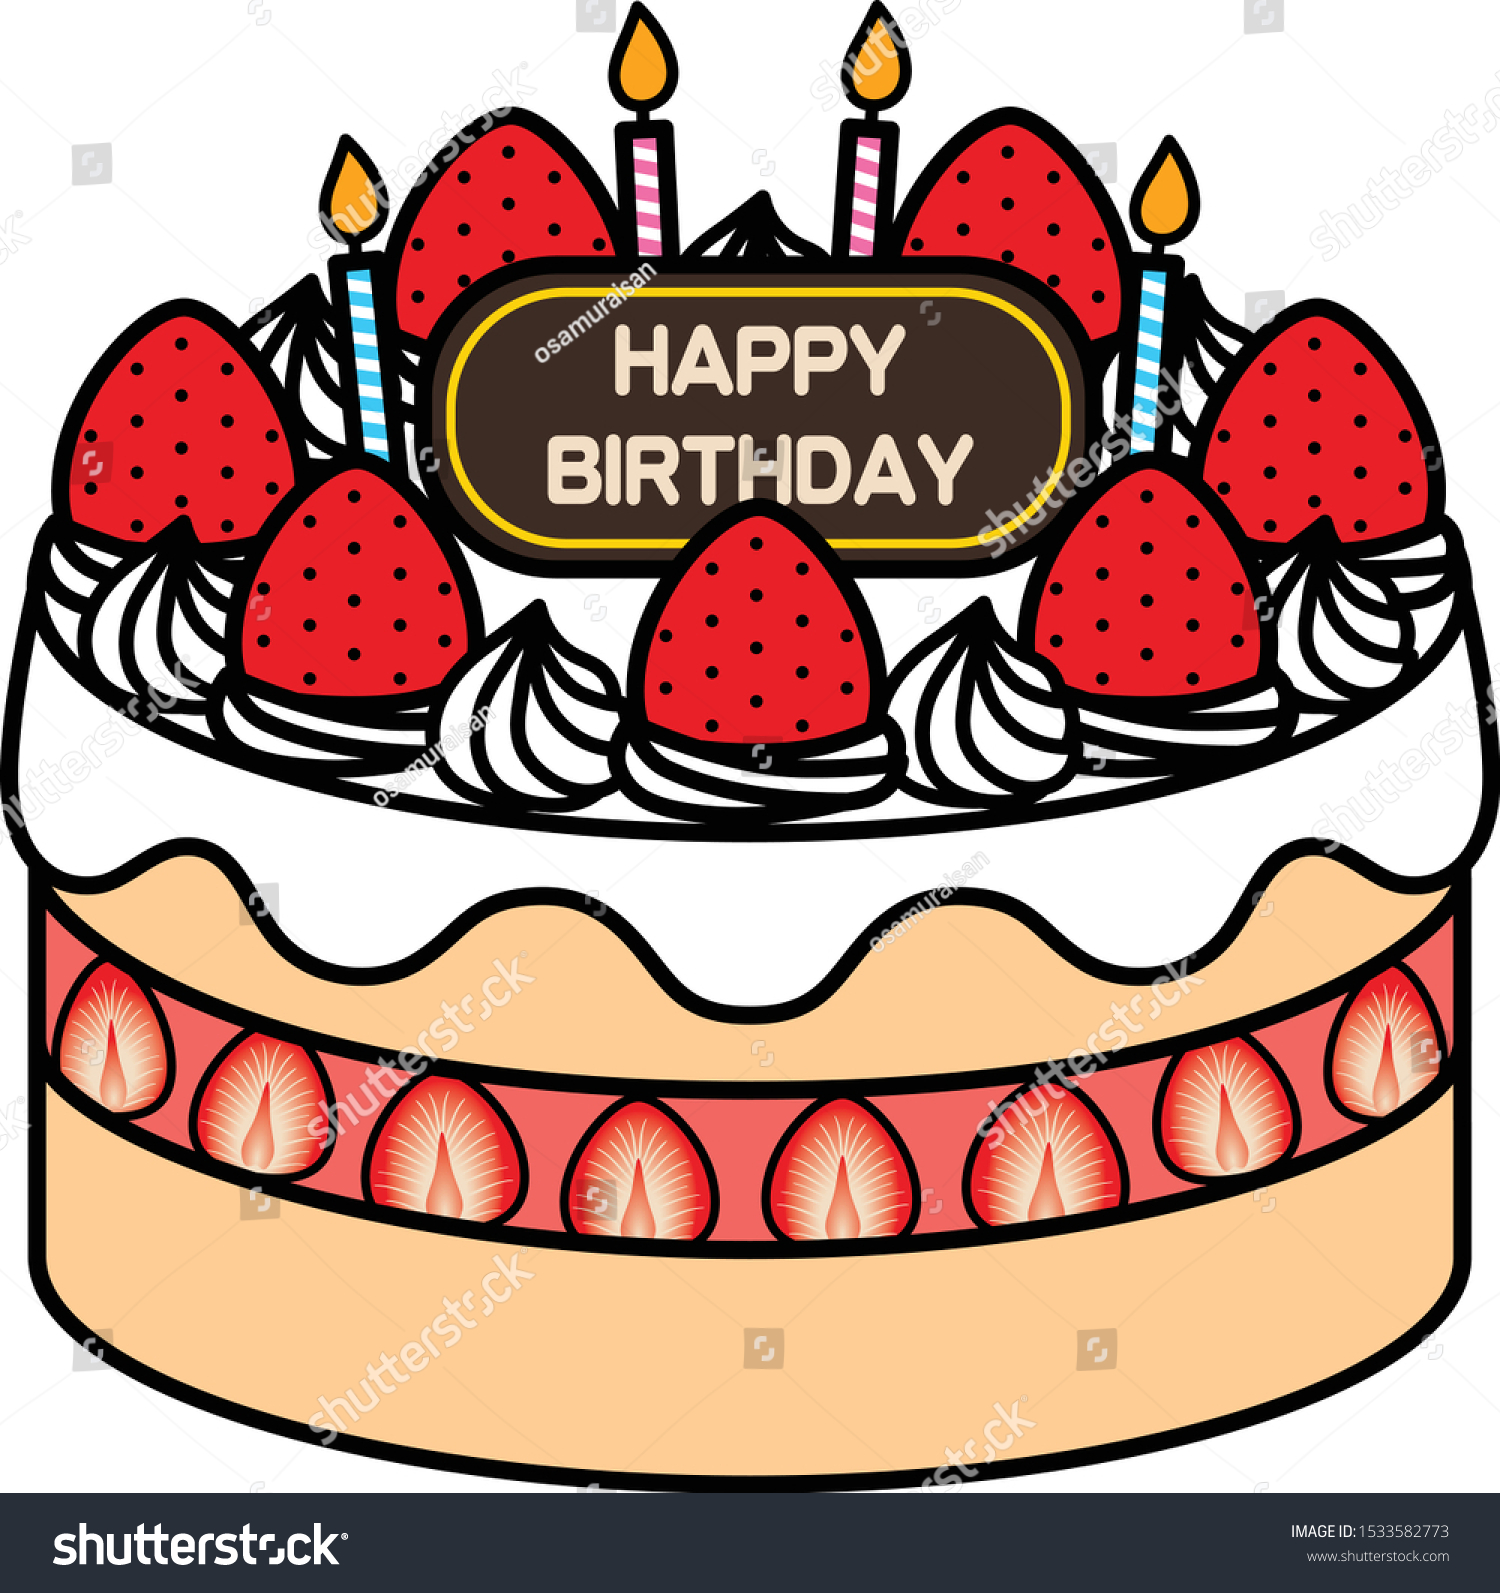 Strawberry Shortcake Birthday Party Stock Vector Royalty Free 1533582773